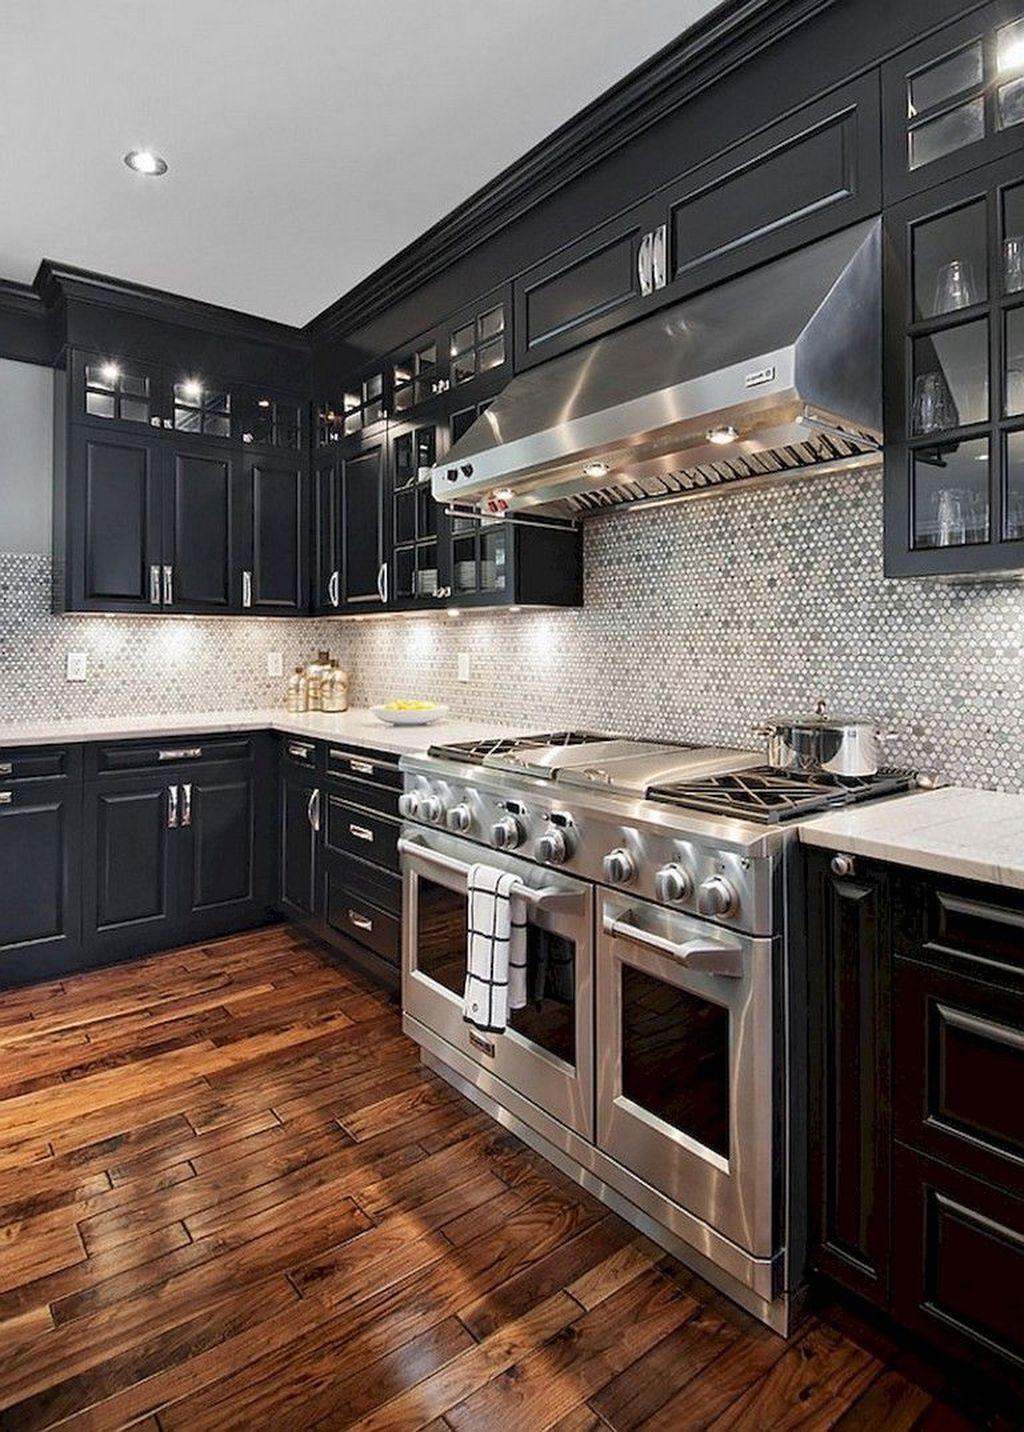 20 Elegant Black Kitchen Design Ideas You Need To Try Custom Kitchen Cabinets Black Kitchen Cabinets Interior Design Kitchen